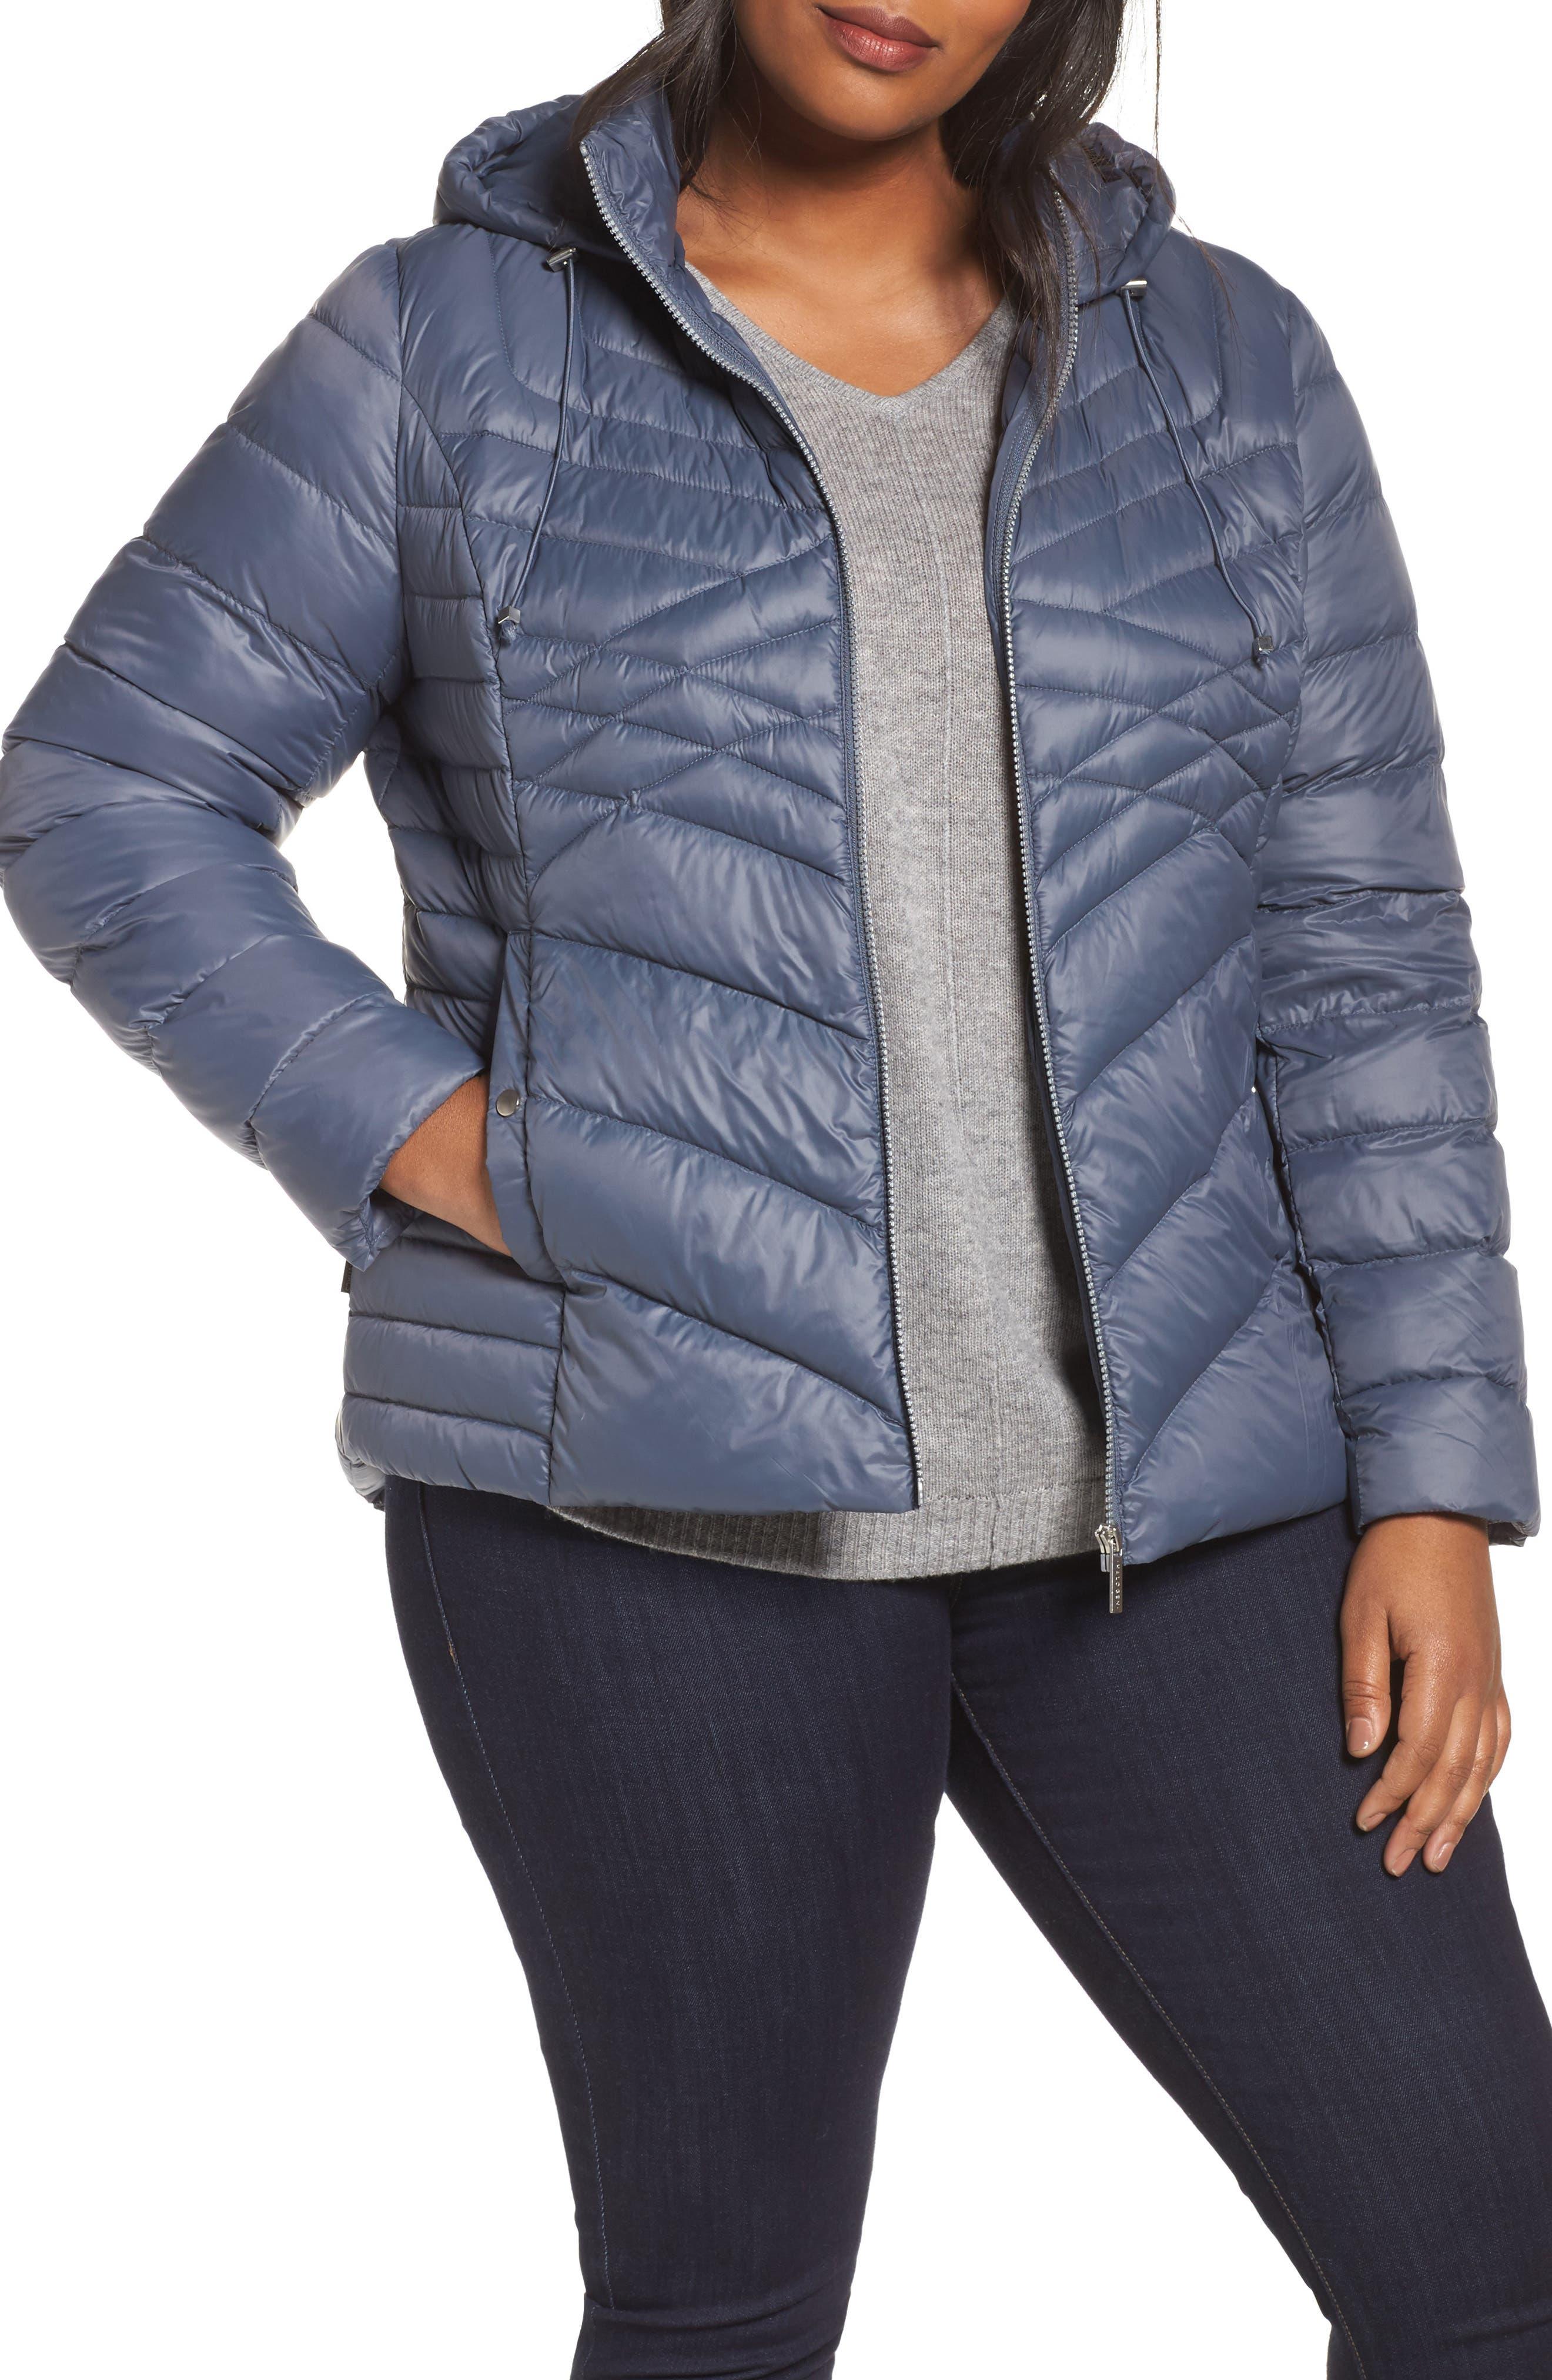 Alternate Image 1 Selected - Halogen® Hooded Down Blend Puffer Jacket (Plus Size)